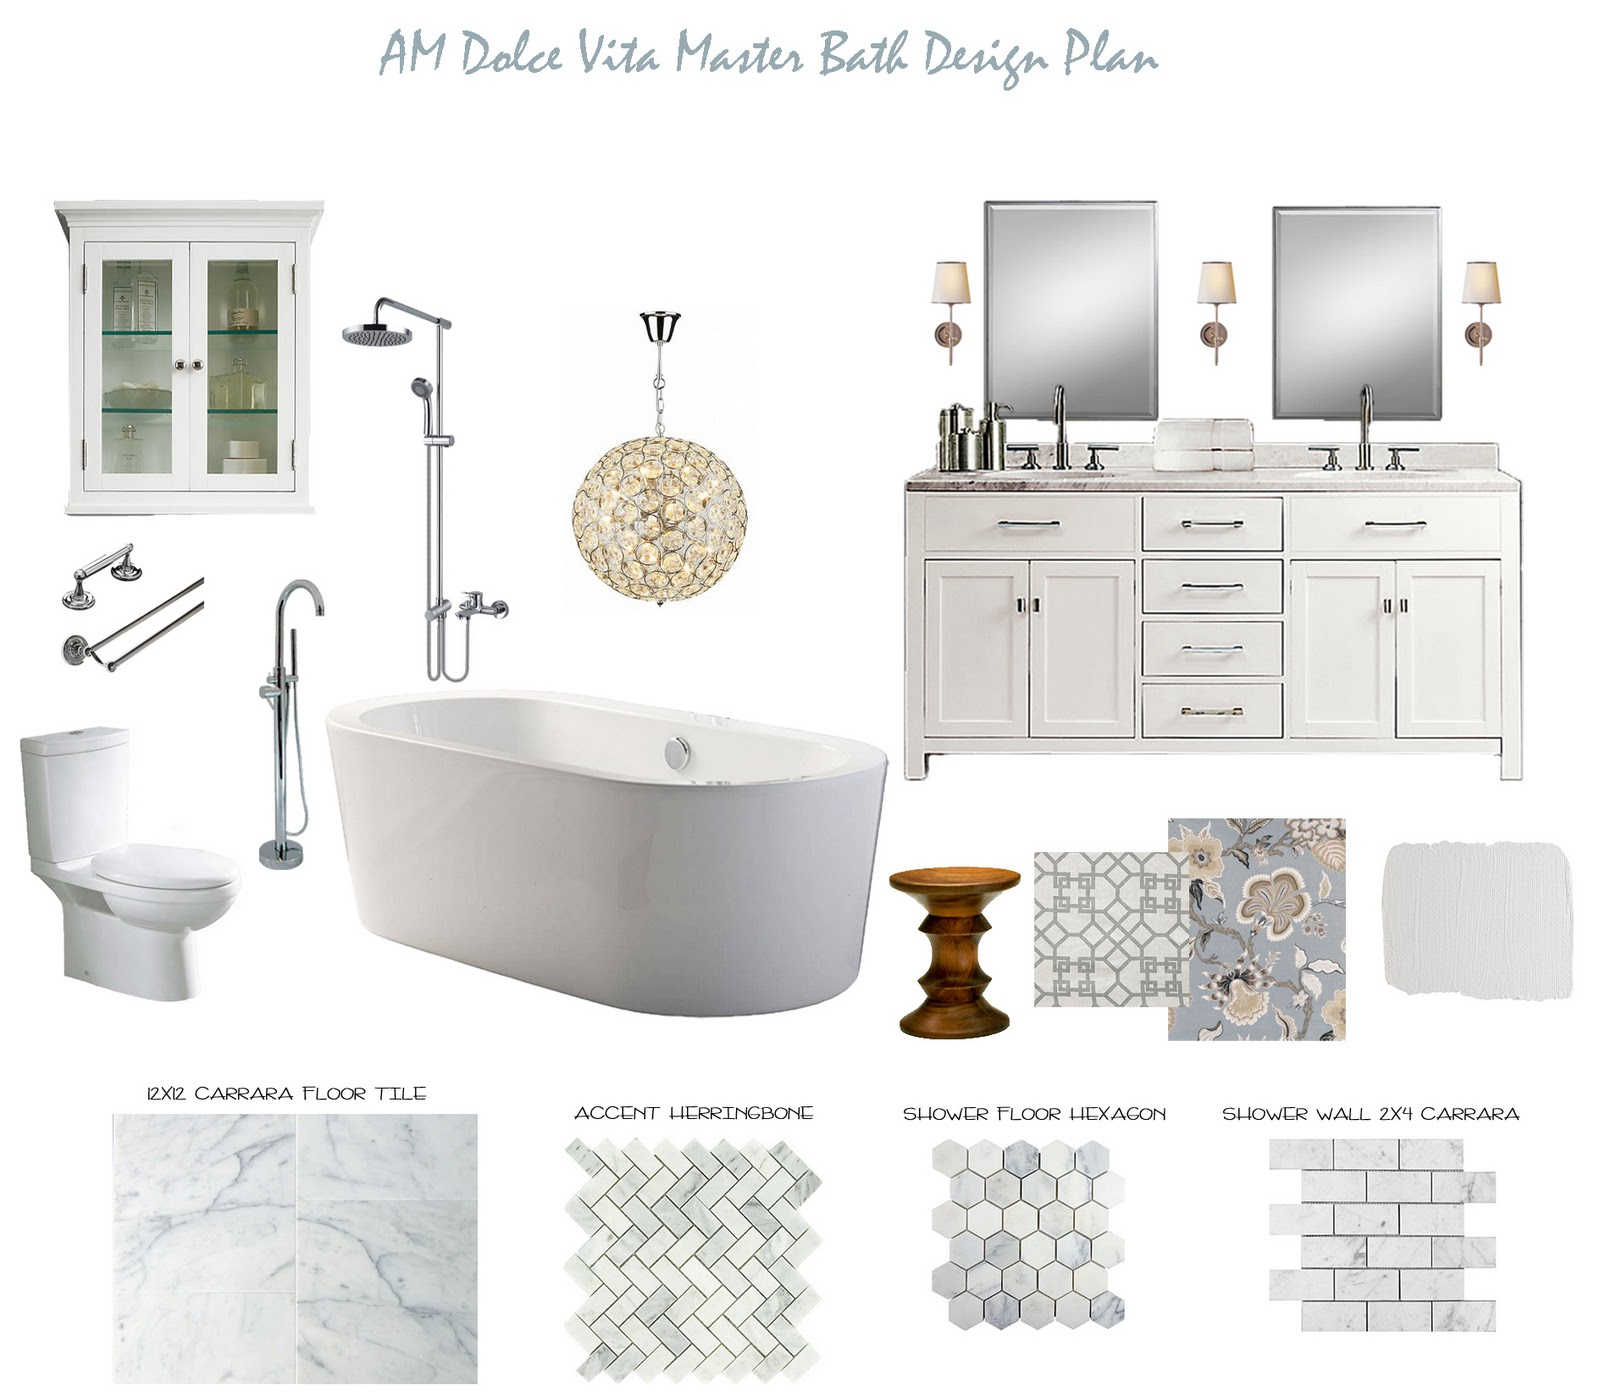 Am dolce vita master bath design plan for Master bathroom designs 2012